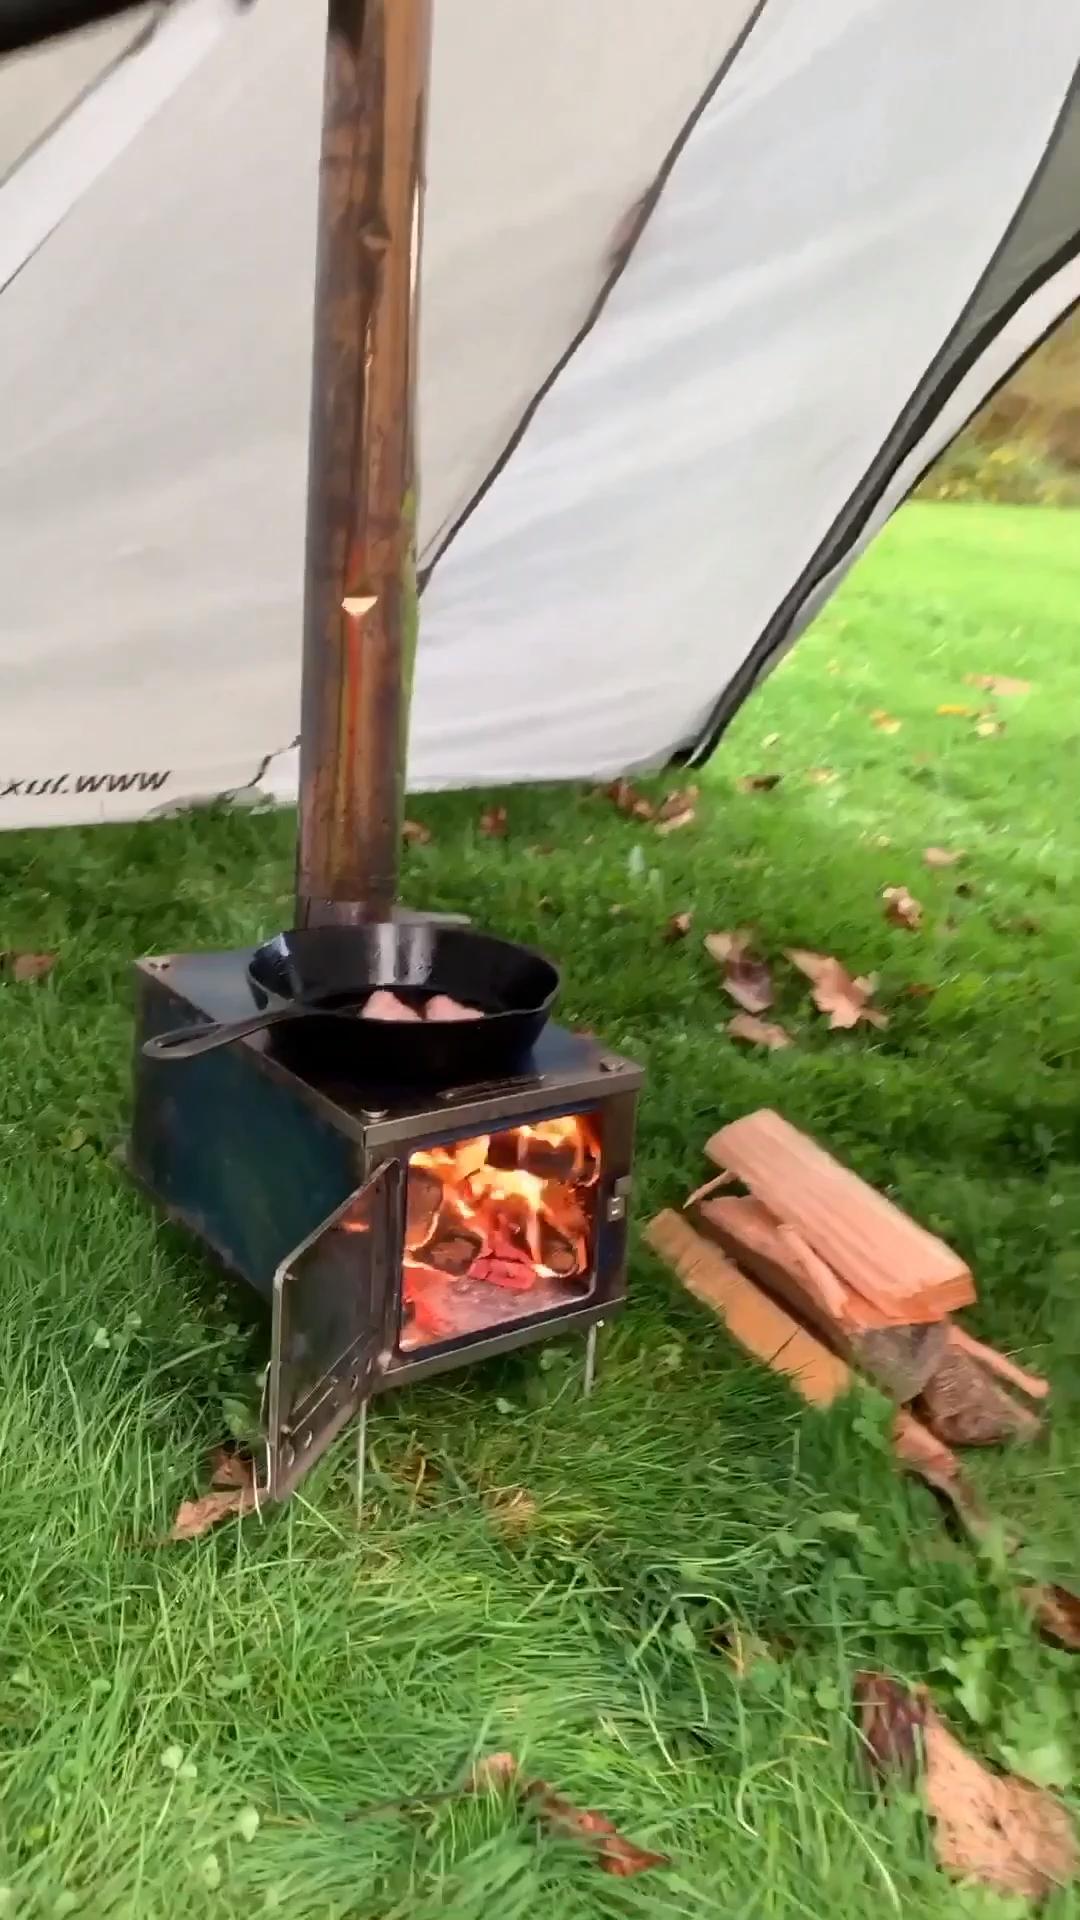 3W Folding Wood Stove (Titanium) for Backpacking Tents#backpacking #folding #sto...  - fire pits #Backpacking #Fire #Folding #Pits #sto #Stove #Tentsbackpacking #Titanium #Wood #Bushcraft #camping #BushcraftCamping